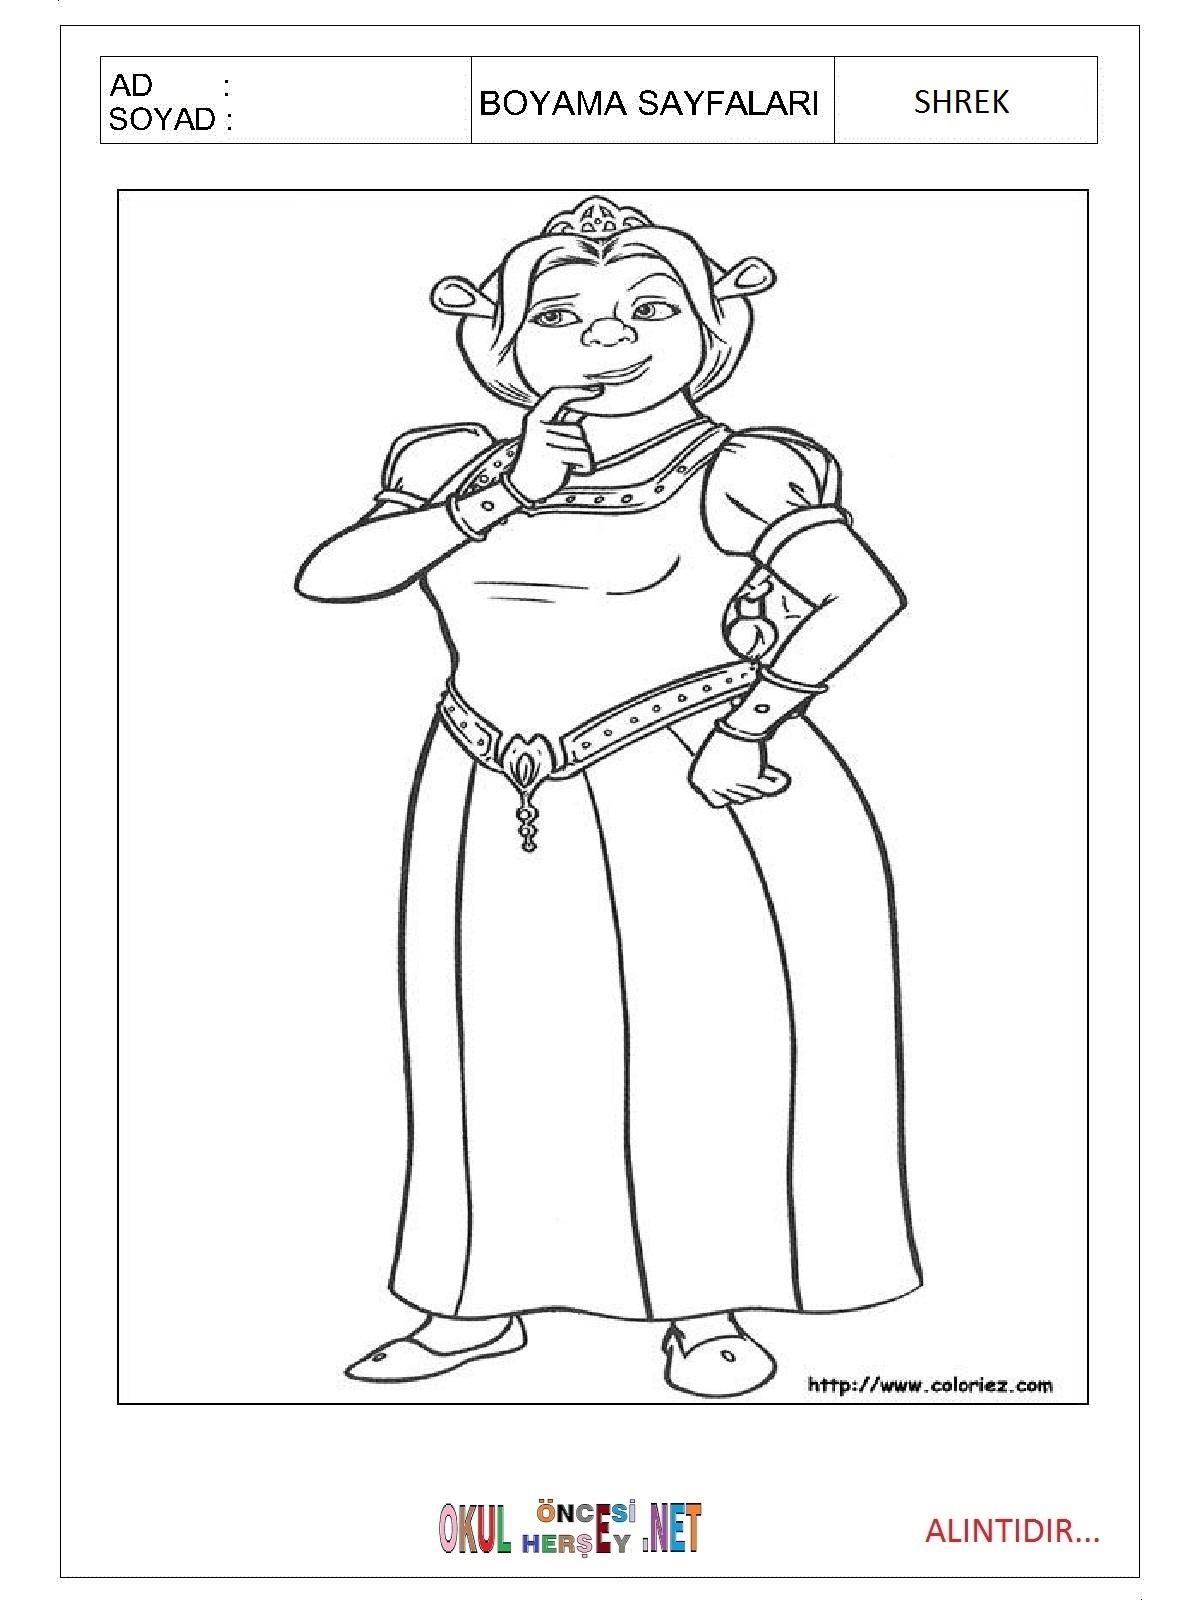 Shrek Boyama Sayfalari